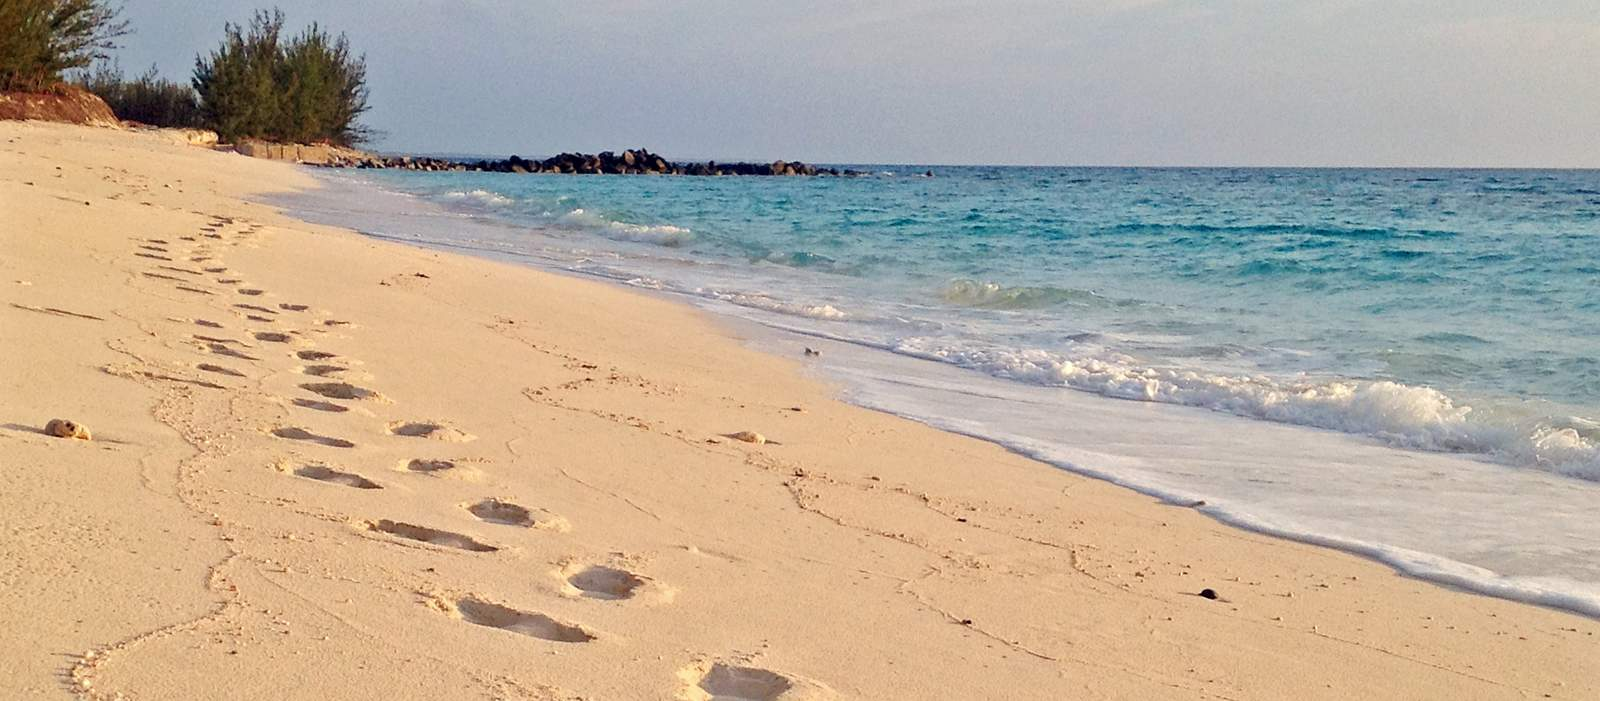 Strandabschnitt auf San Salvador